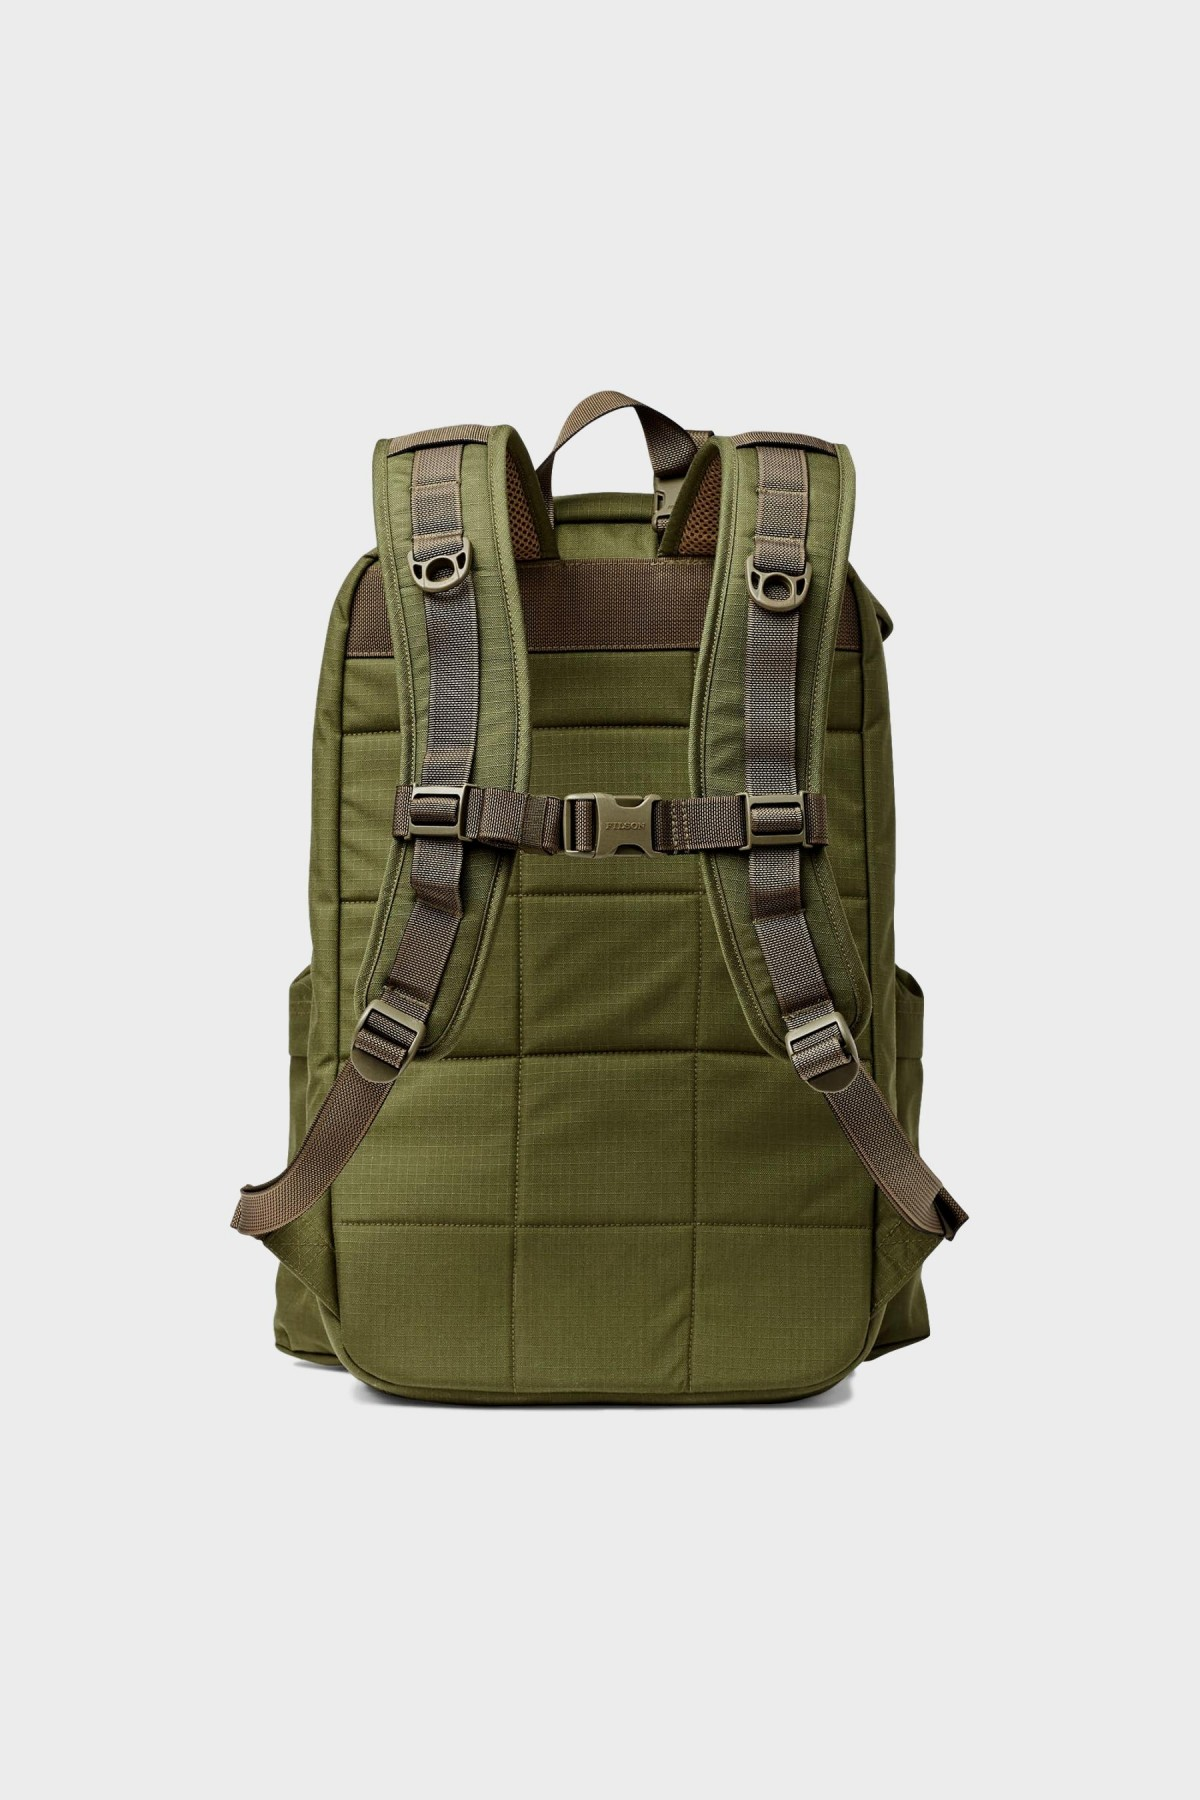 Filson Ripstop Nylon Backpack in Surplus Green